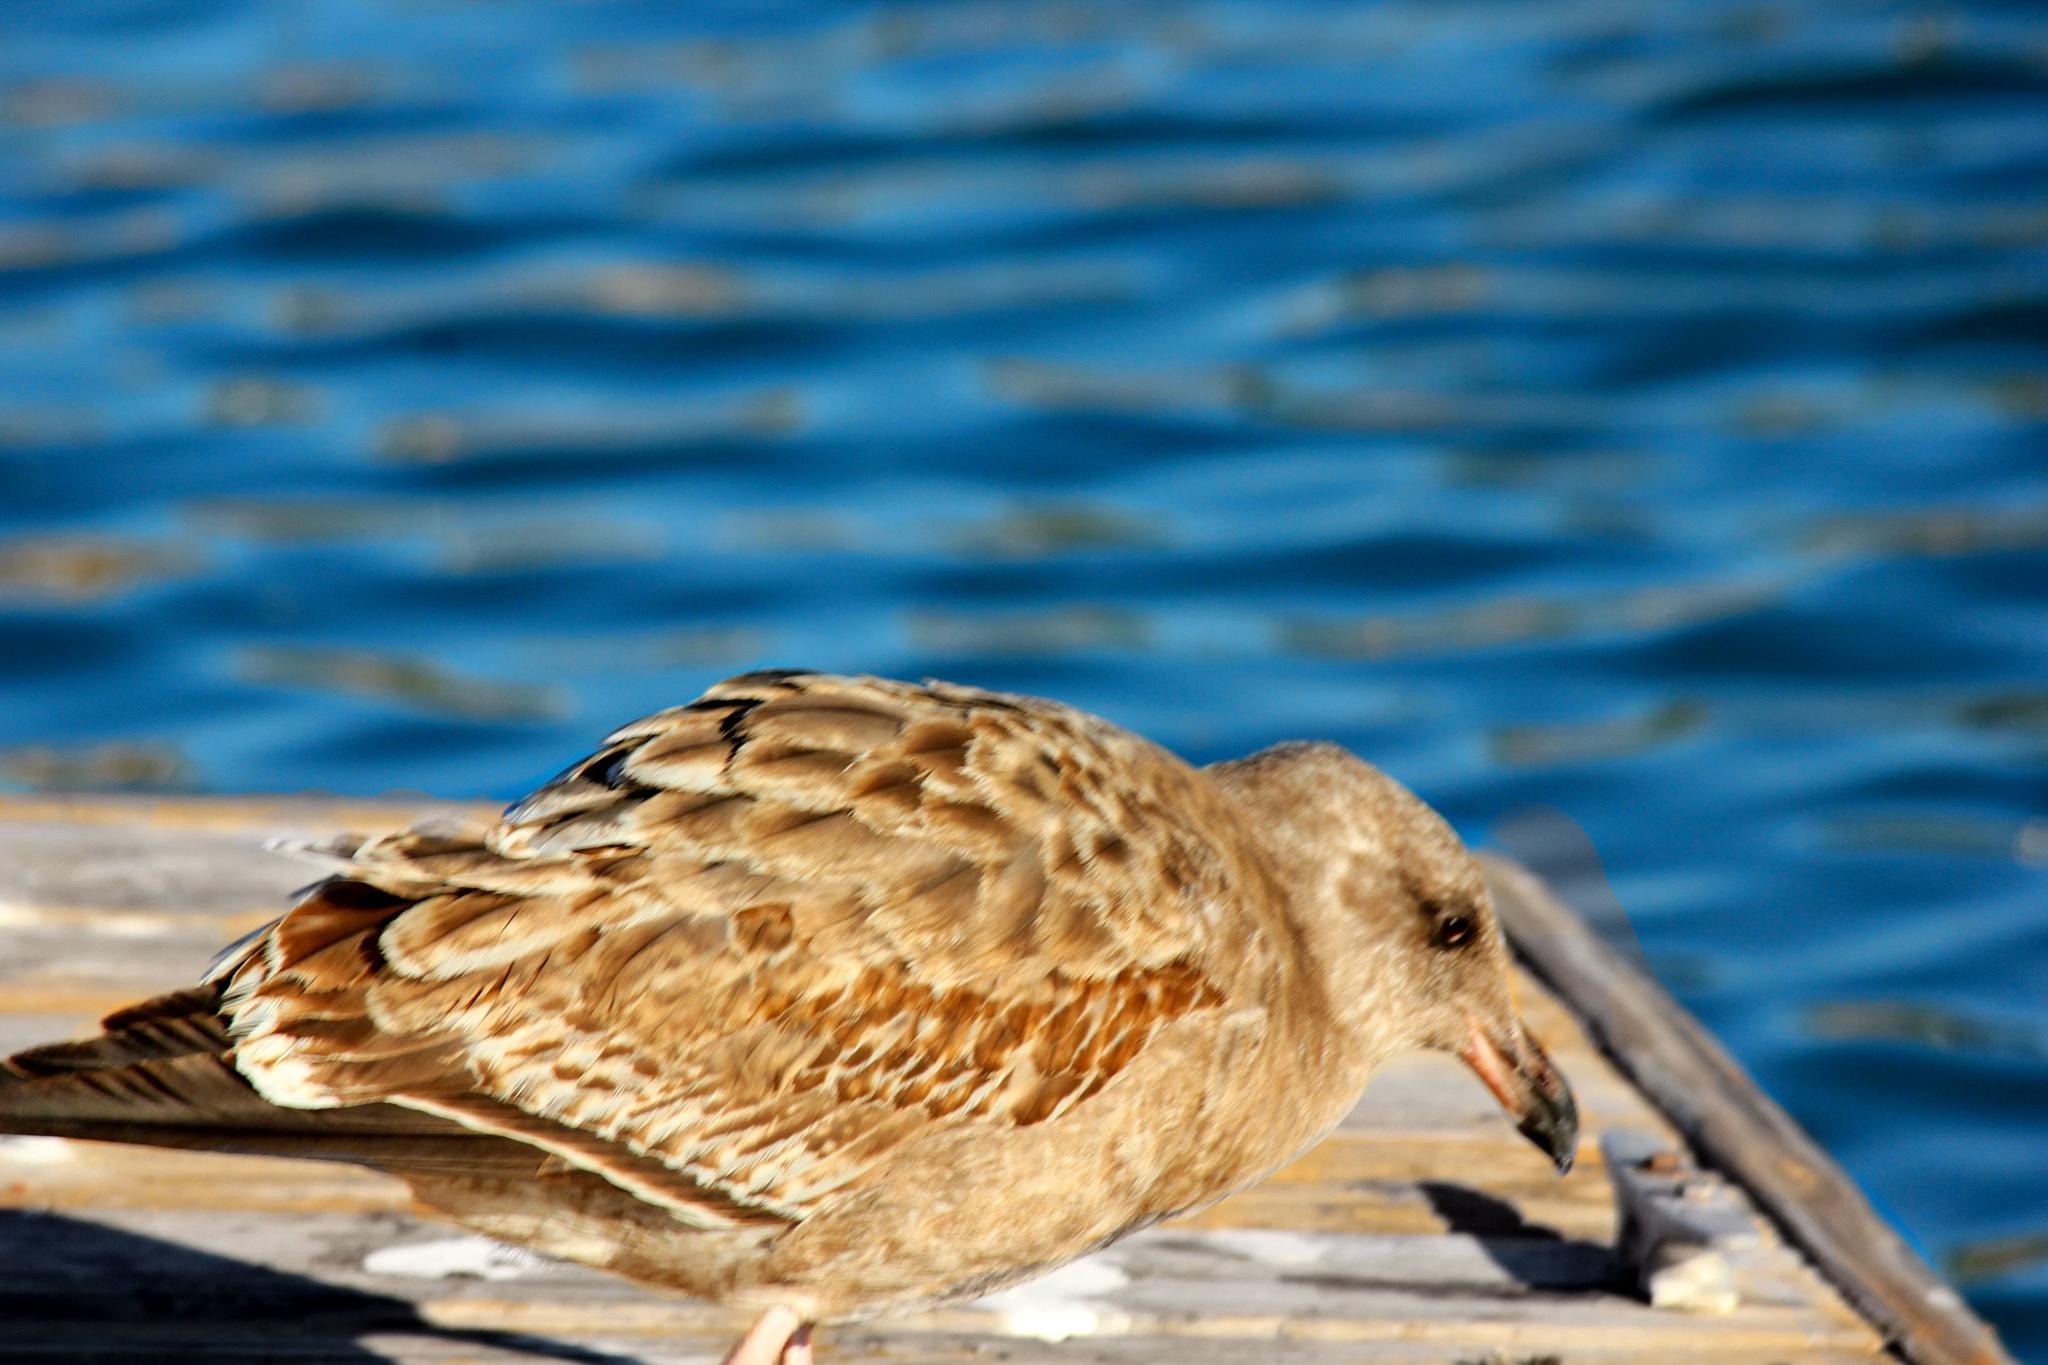 Sitting on the dock of a bay ... by Tiffanie Faith Chezum